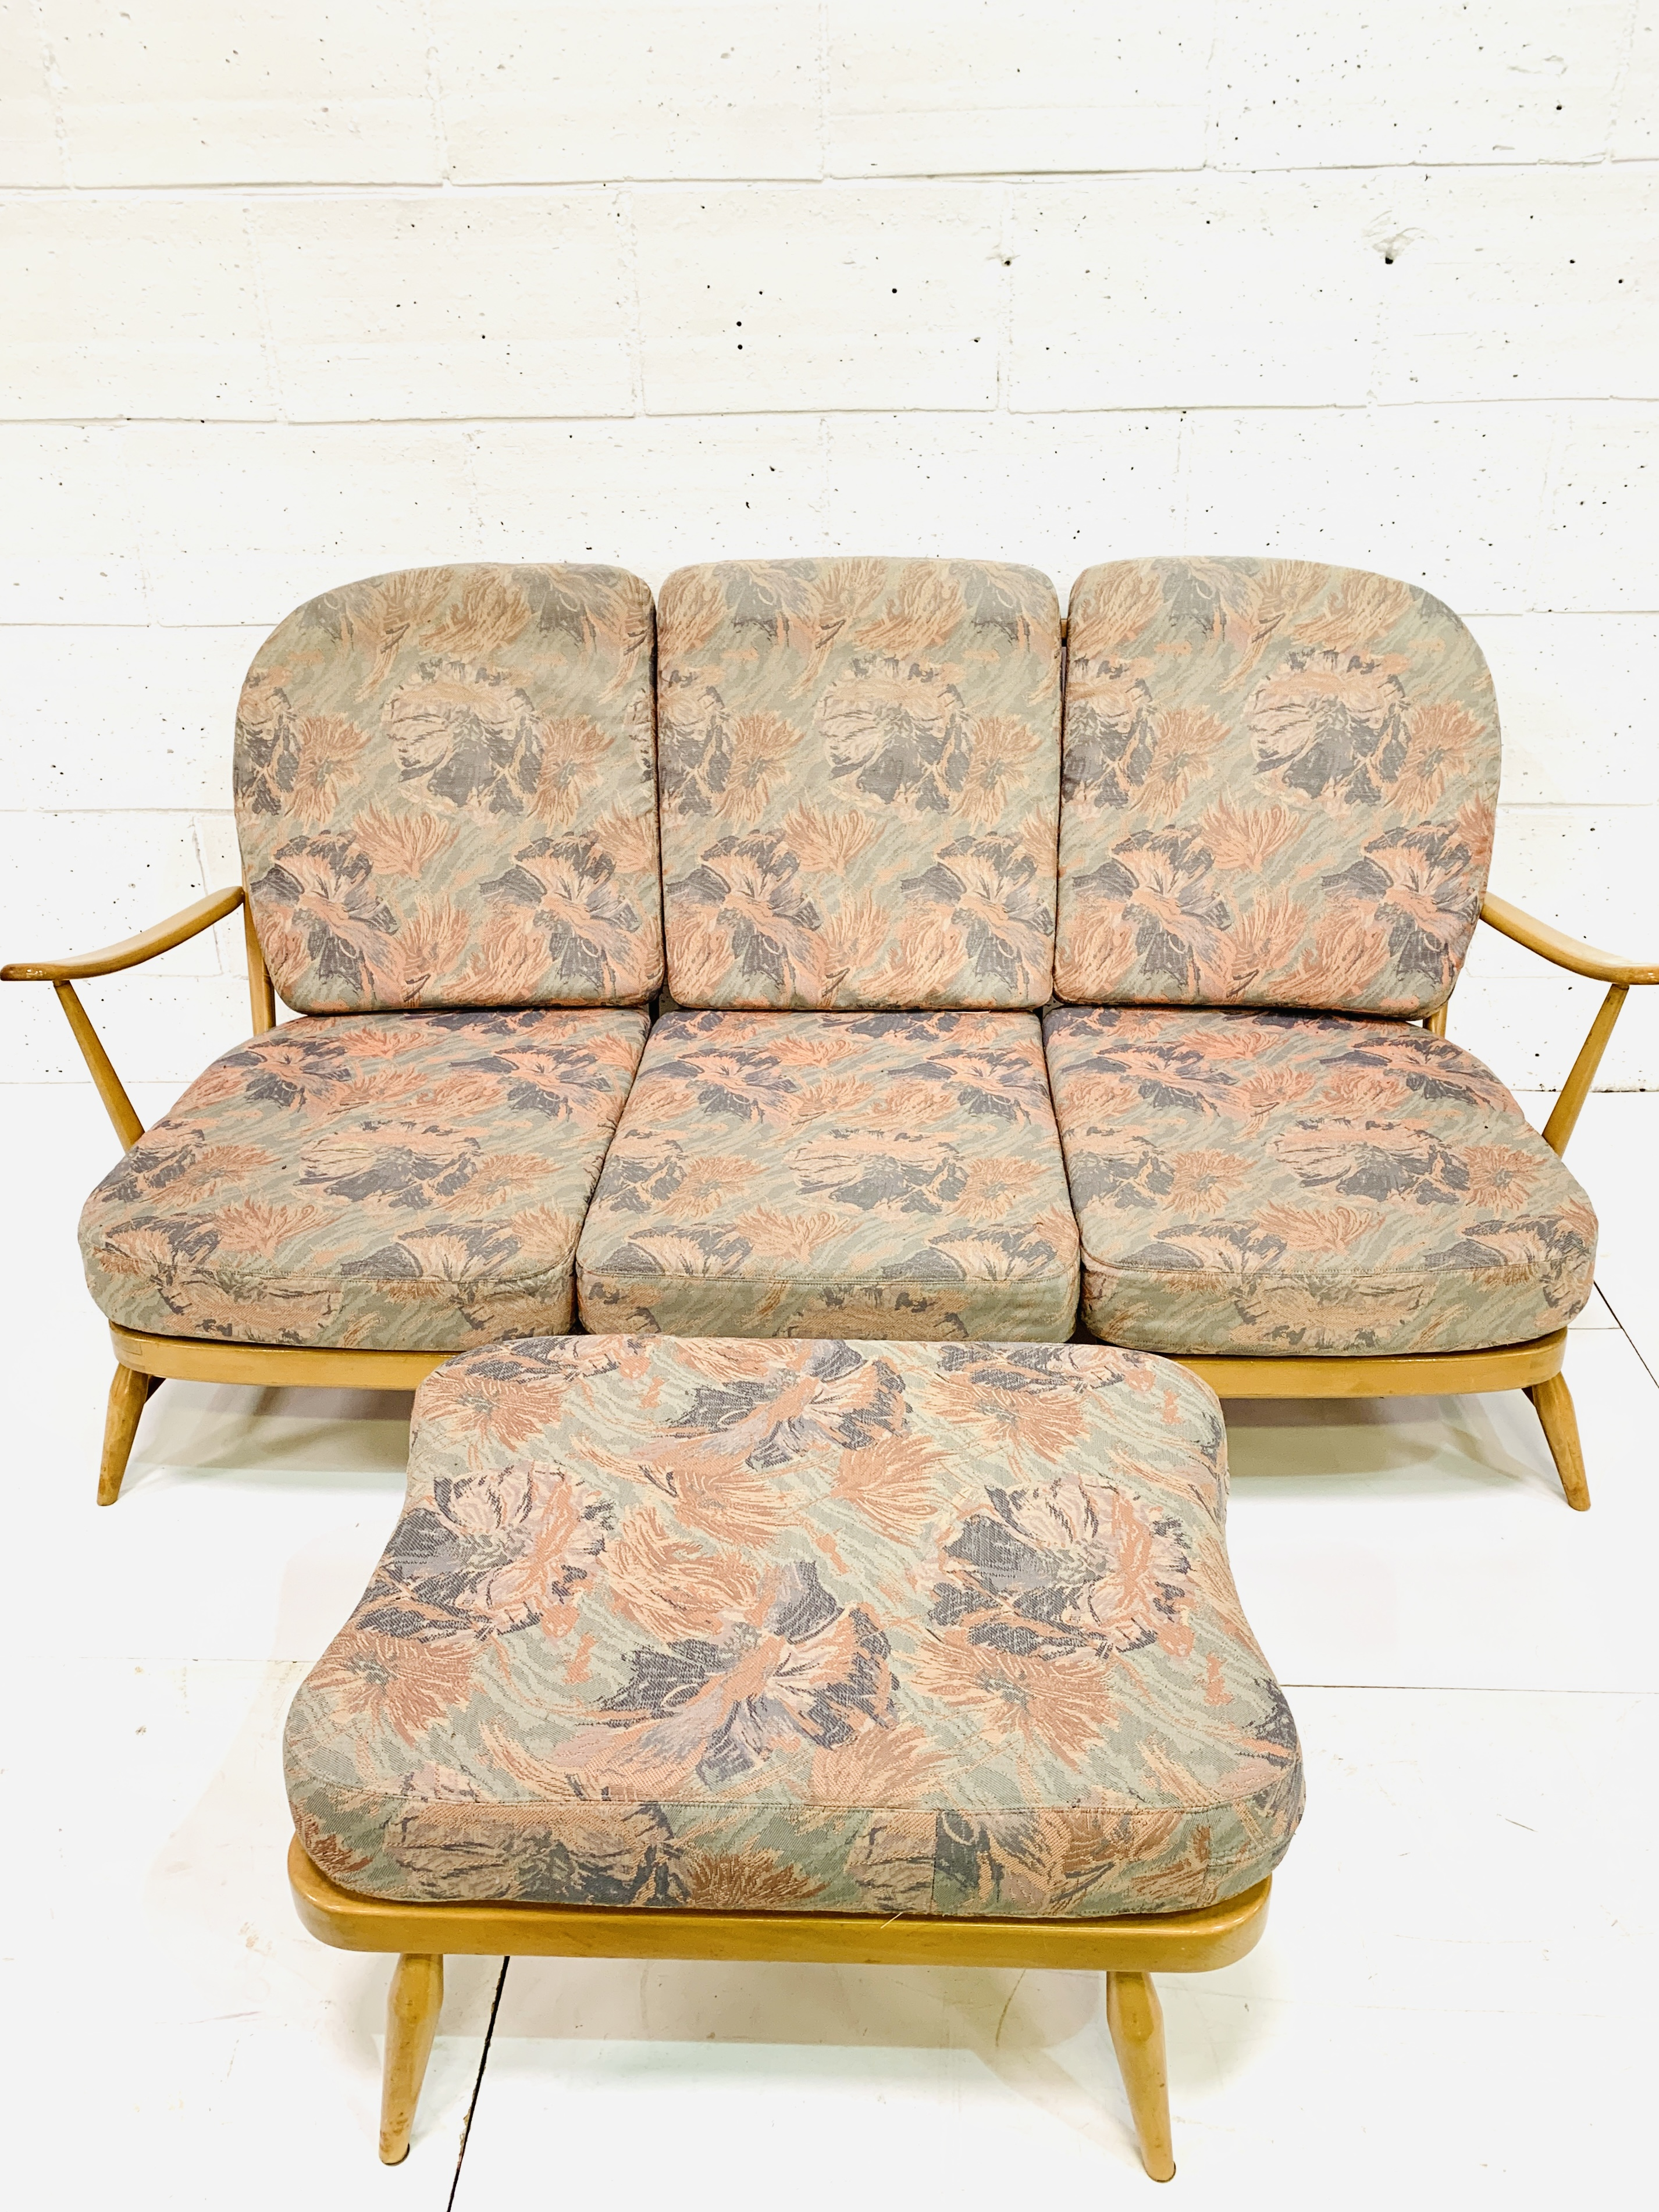 Ercol three seat sofa